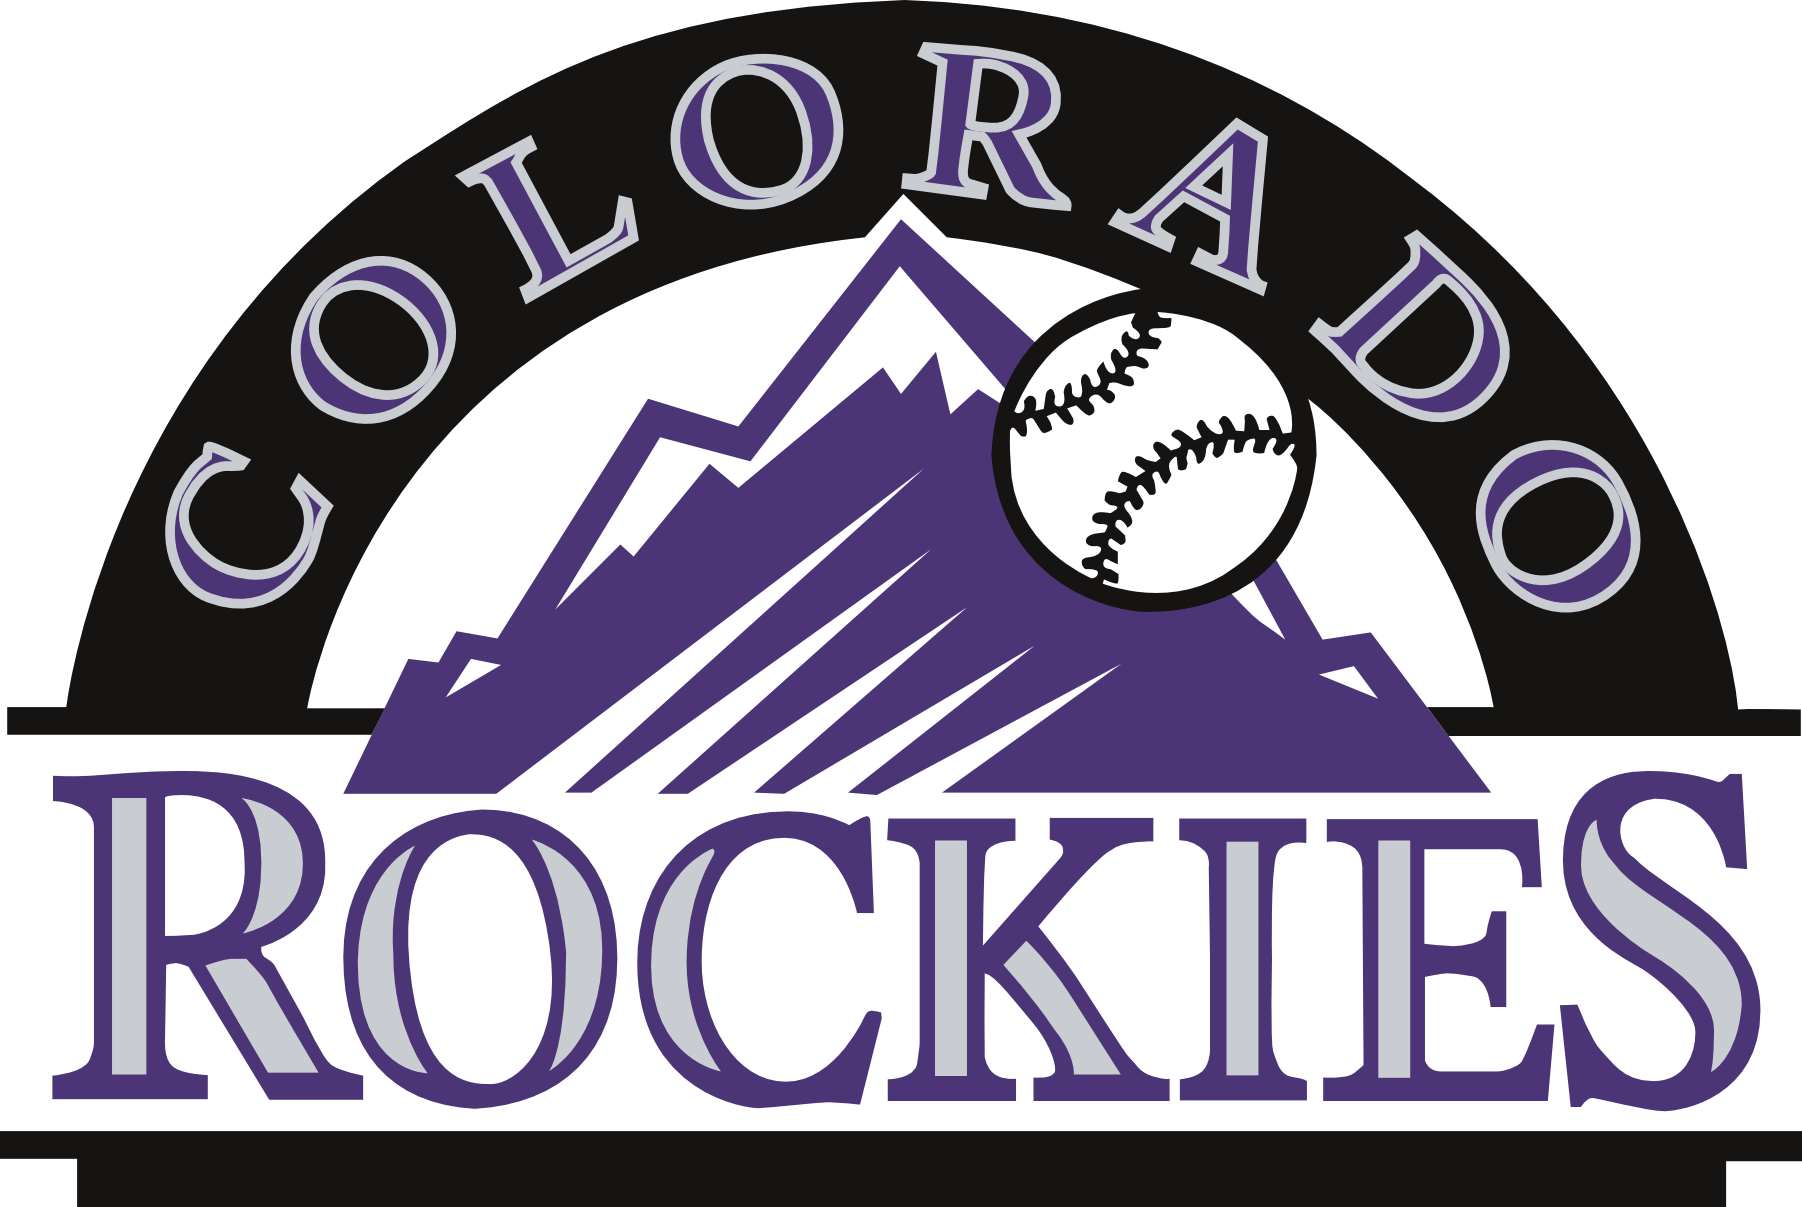 COLORADO ROCKIES baseball mlb 1 wallpaper 1802x1207 227930 1802x1207